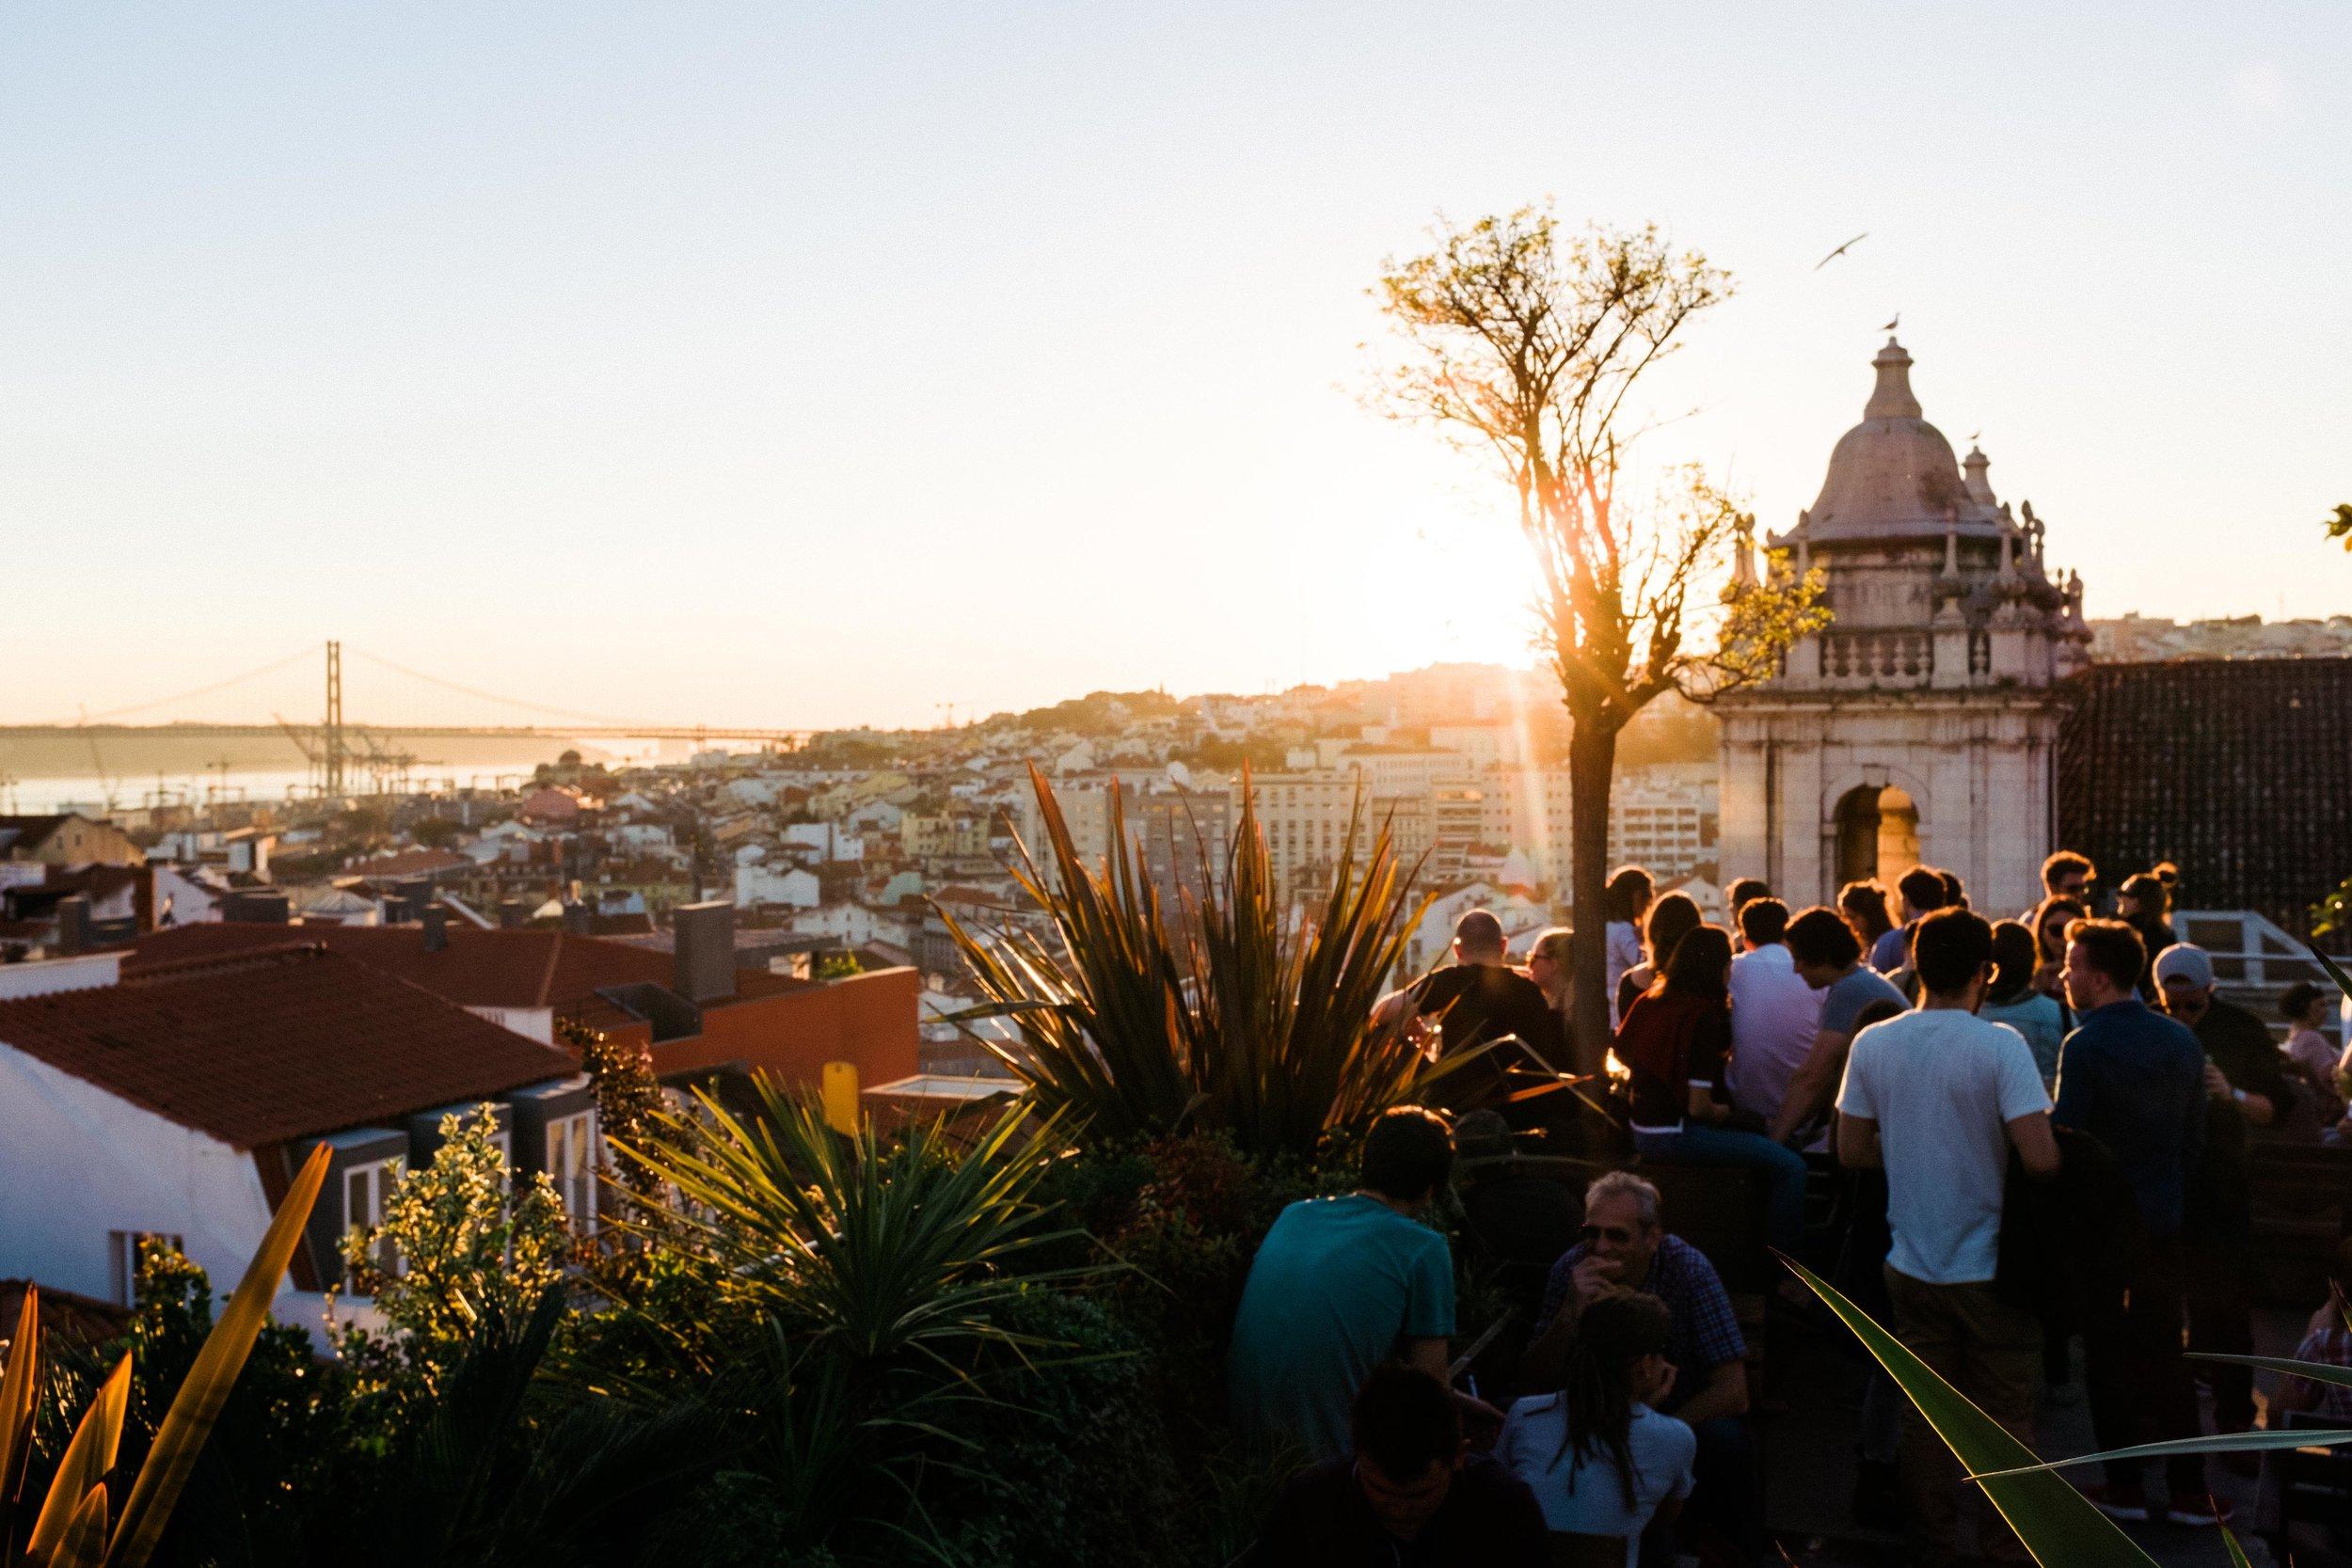 lisbon-portugal-park-bar-sunset